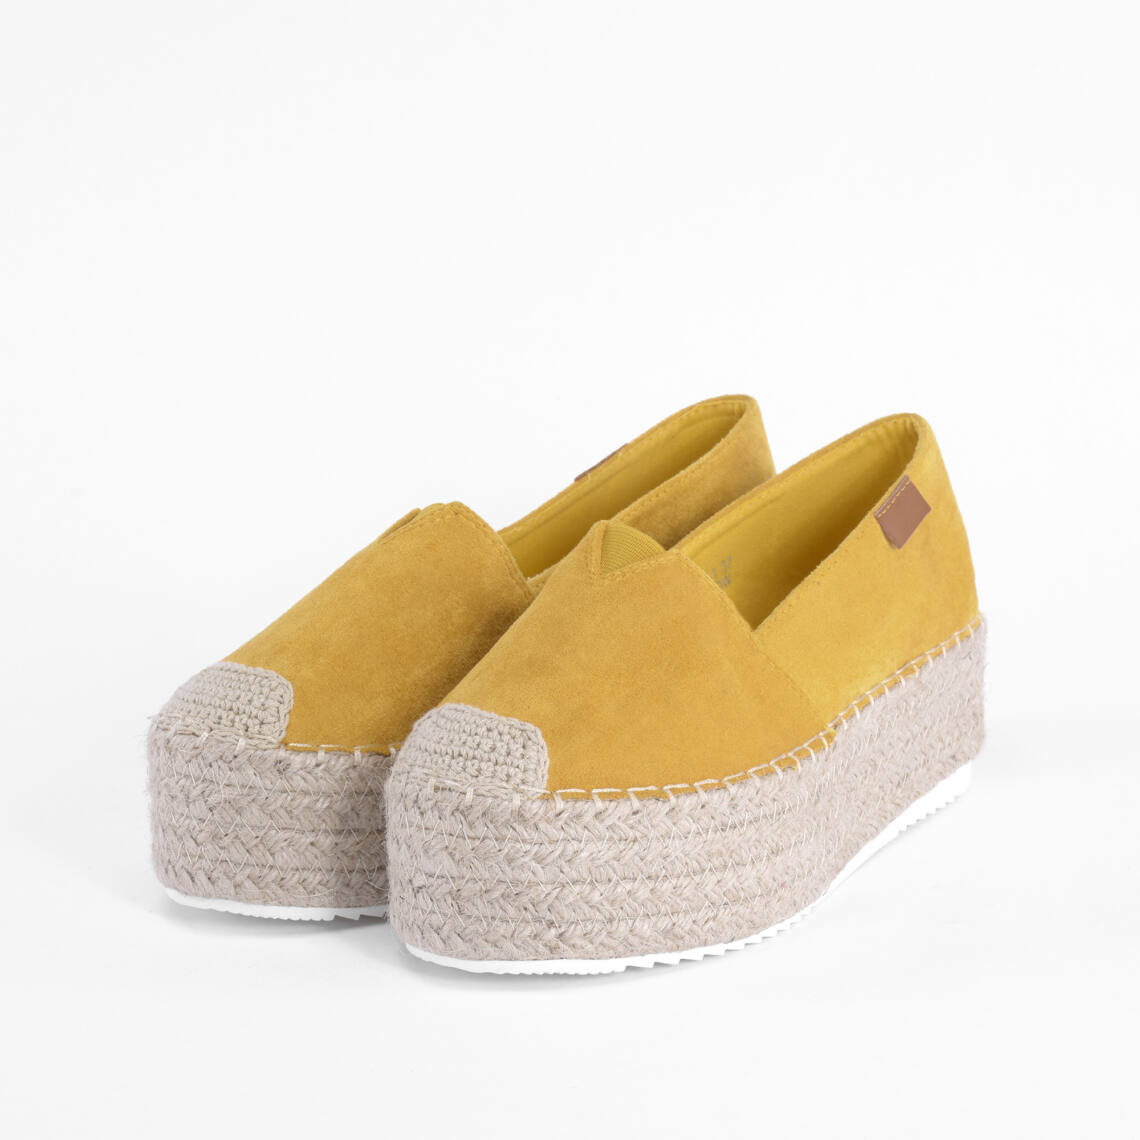 0854677fa466 Komer Sárga Női Művelúr Magas talpú Félcipő - MAGAS TALPÚ - Női cipő ...